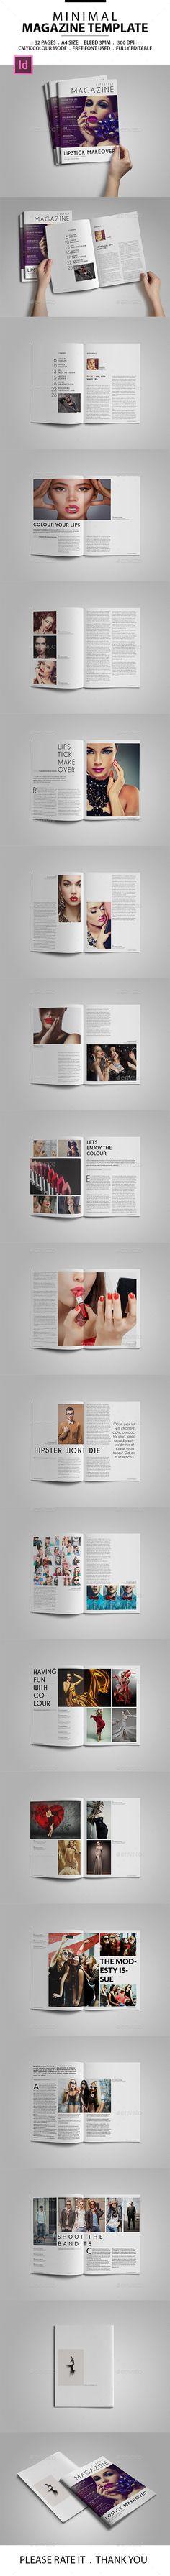 Minimal Magazine Template #design Download: http://graphicriver.net/item/minimal-magazine-template/12506166?ref=ksioks